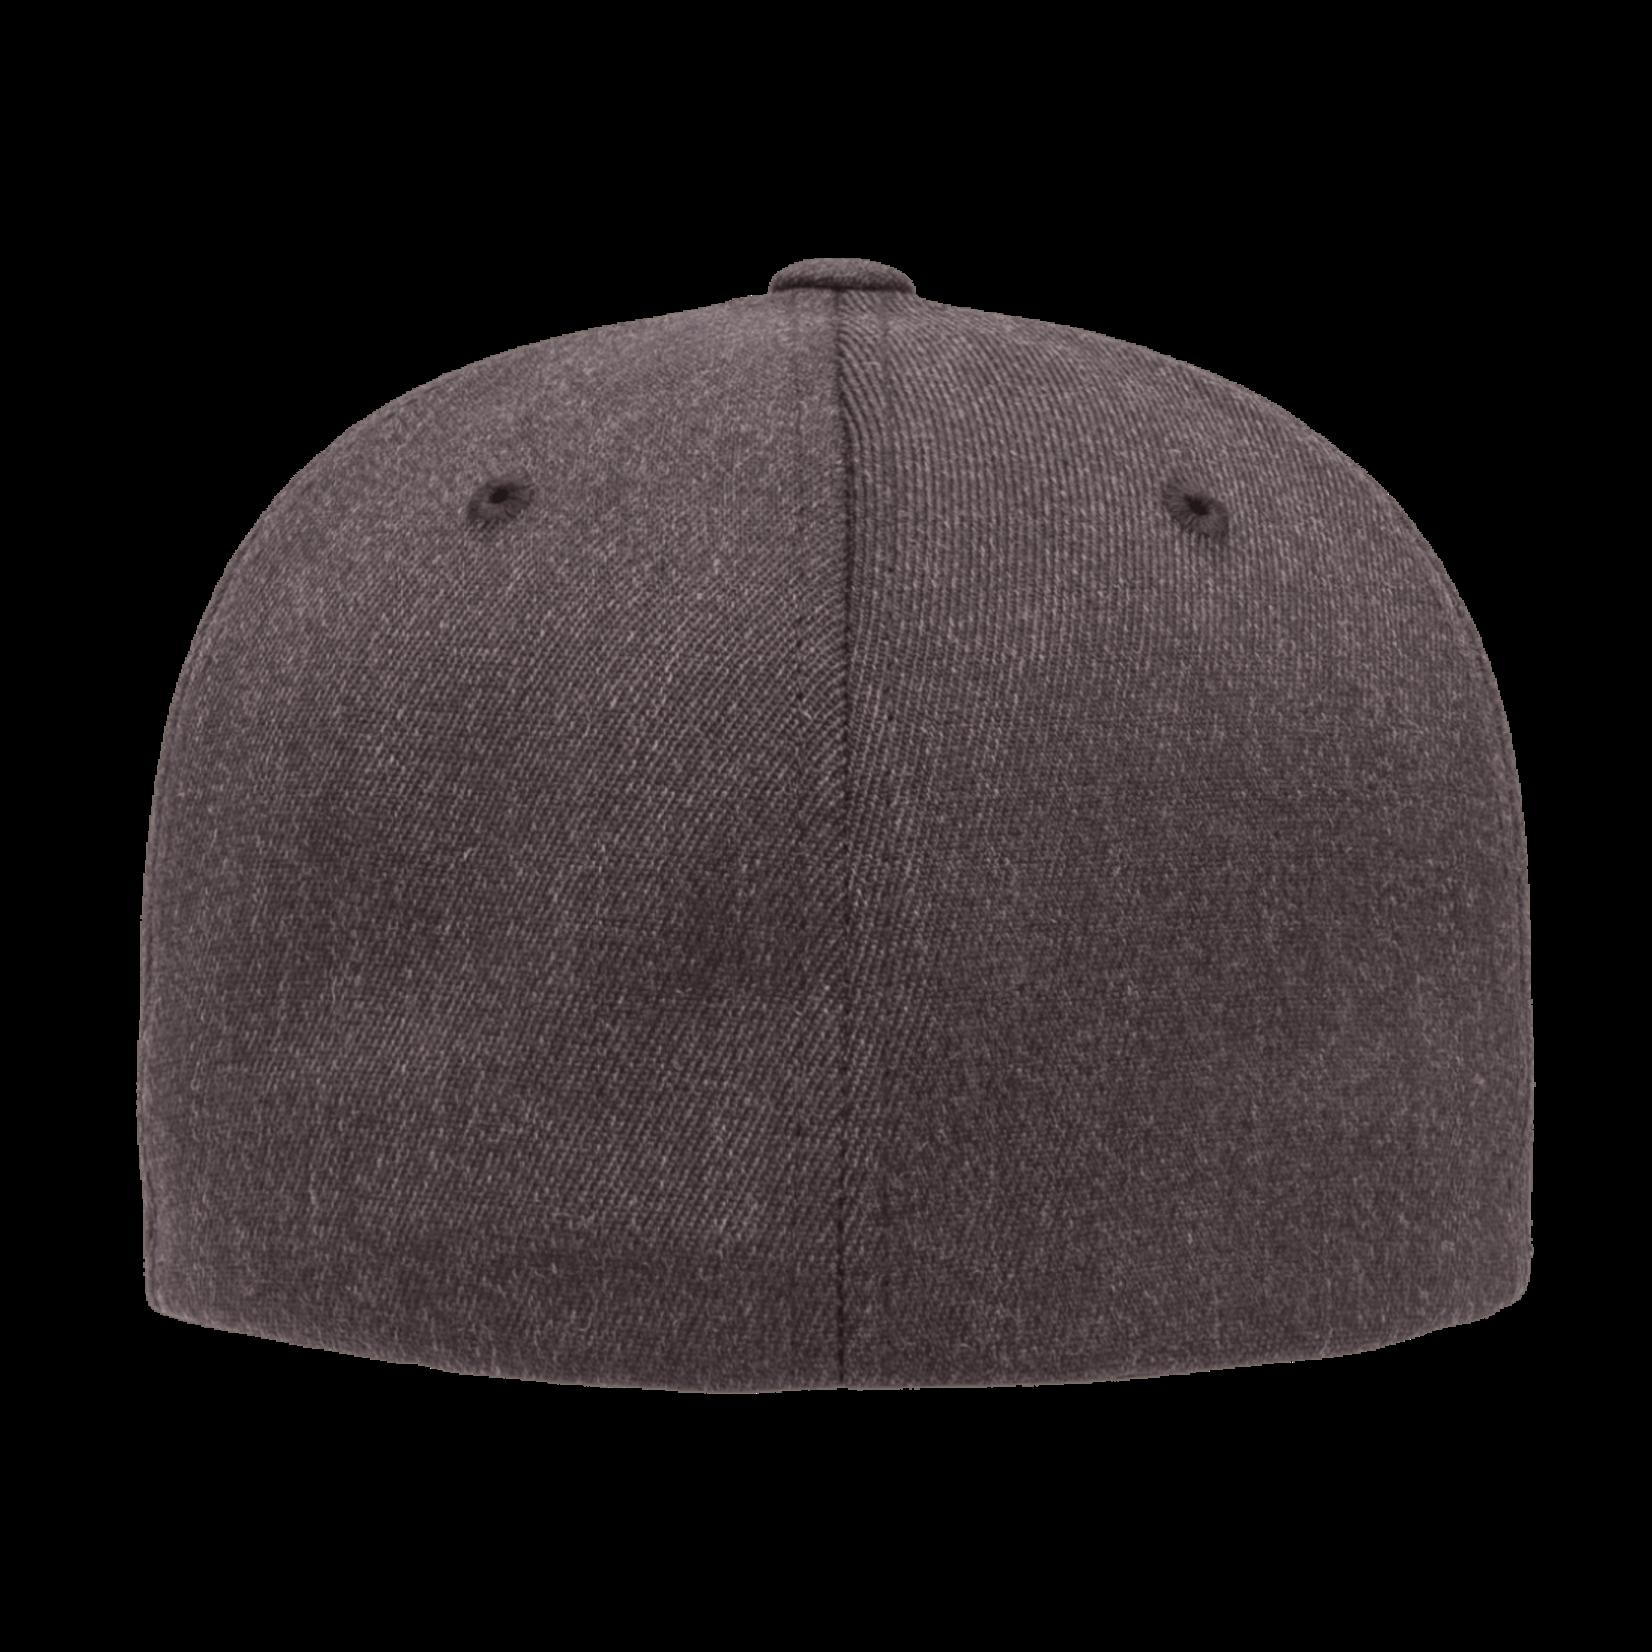 Flexfit Flexfit 6477 Wool Blend Ballcap - Dark Heather Grey